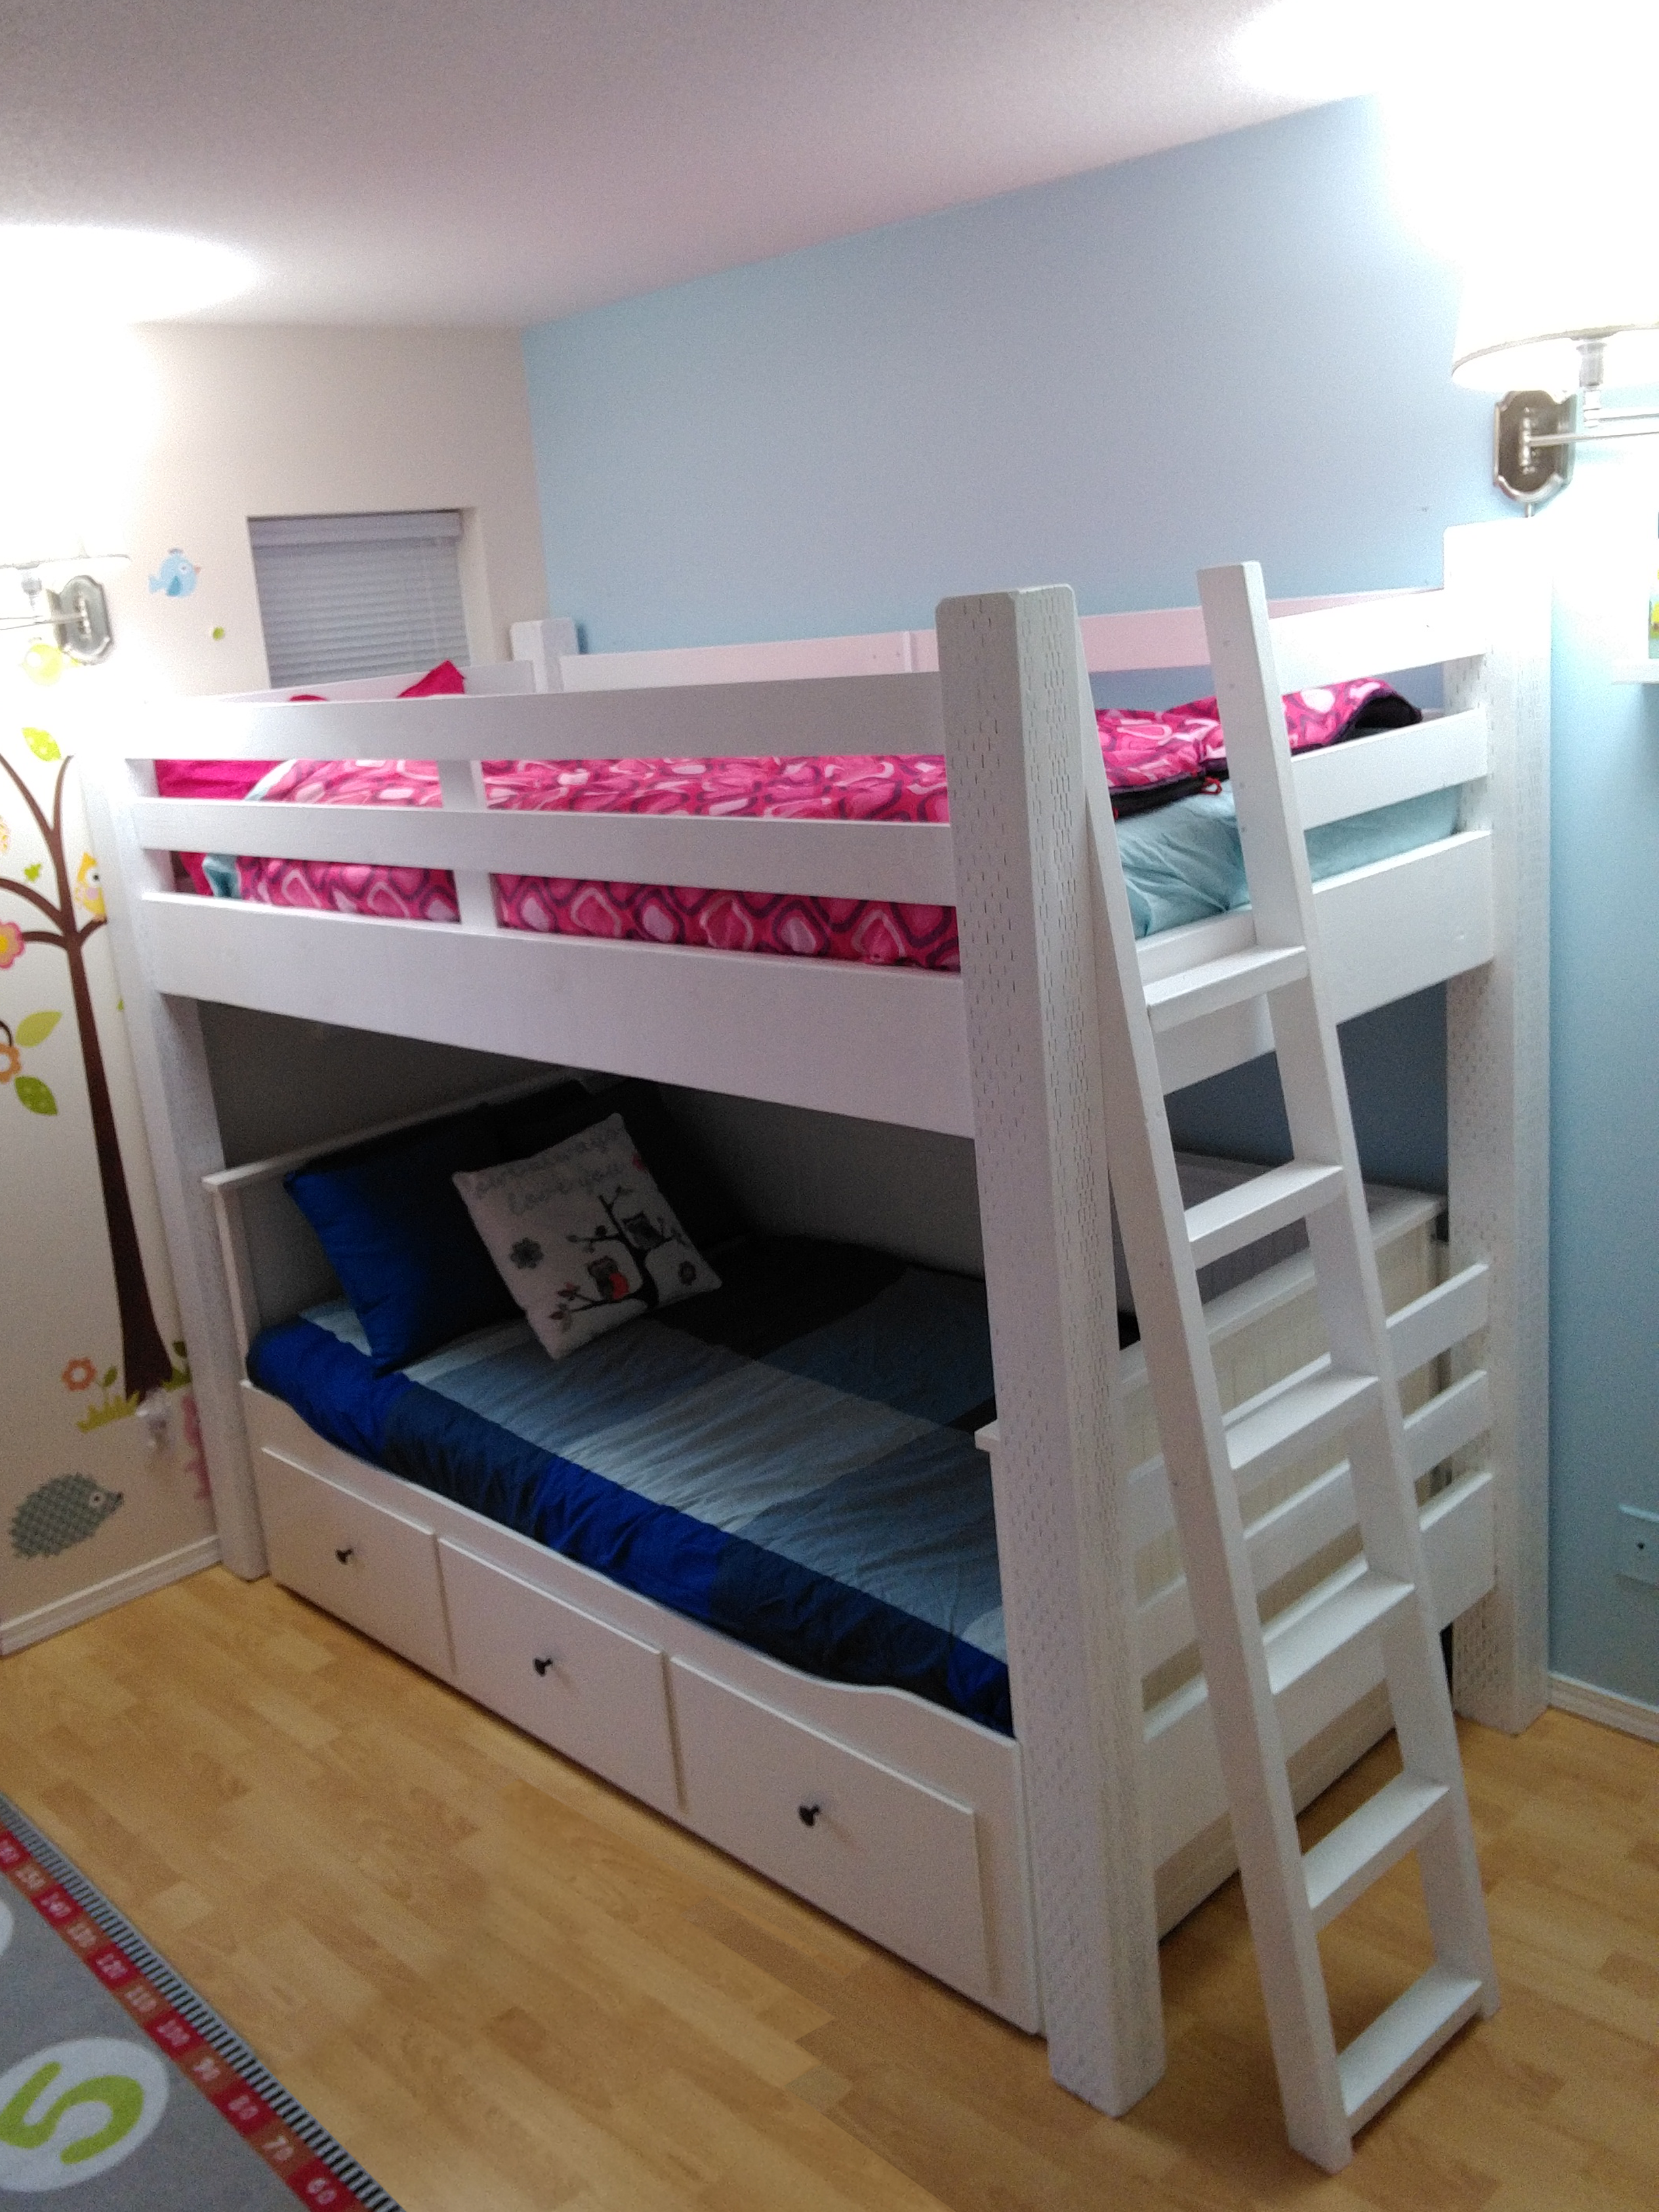 Custom Loft Bed Built To Wrap The Ikea Hemnes Daybed Mit Bildern Bett Kinderzimmer Stuva Hochbett Bett